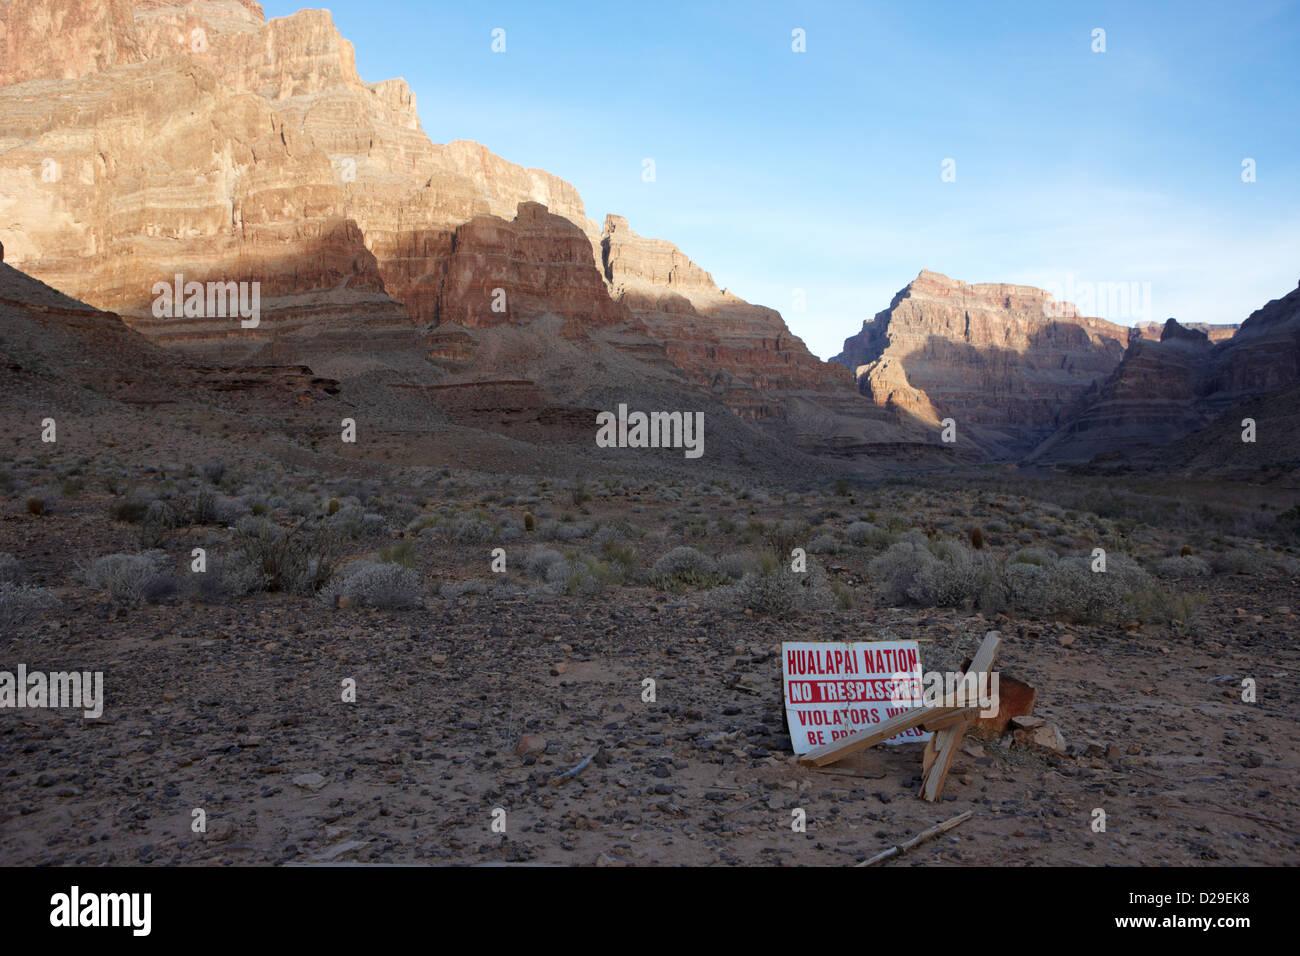 sign at the base of the grand canyon marking edge of the hualapai nation territory Arizona USA Stock Photo